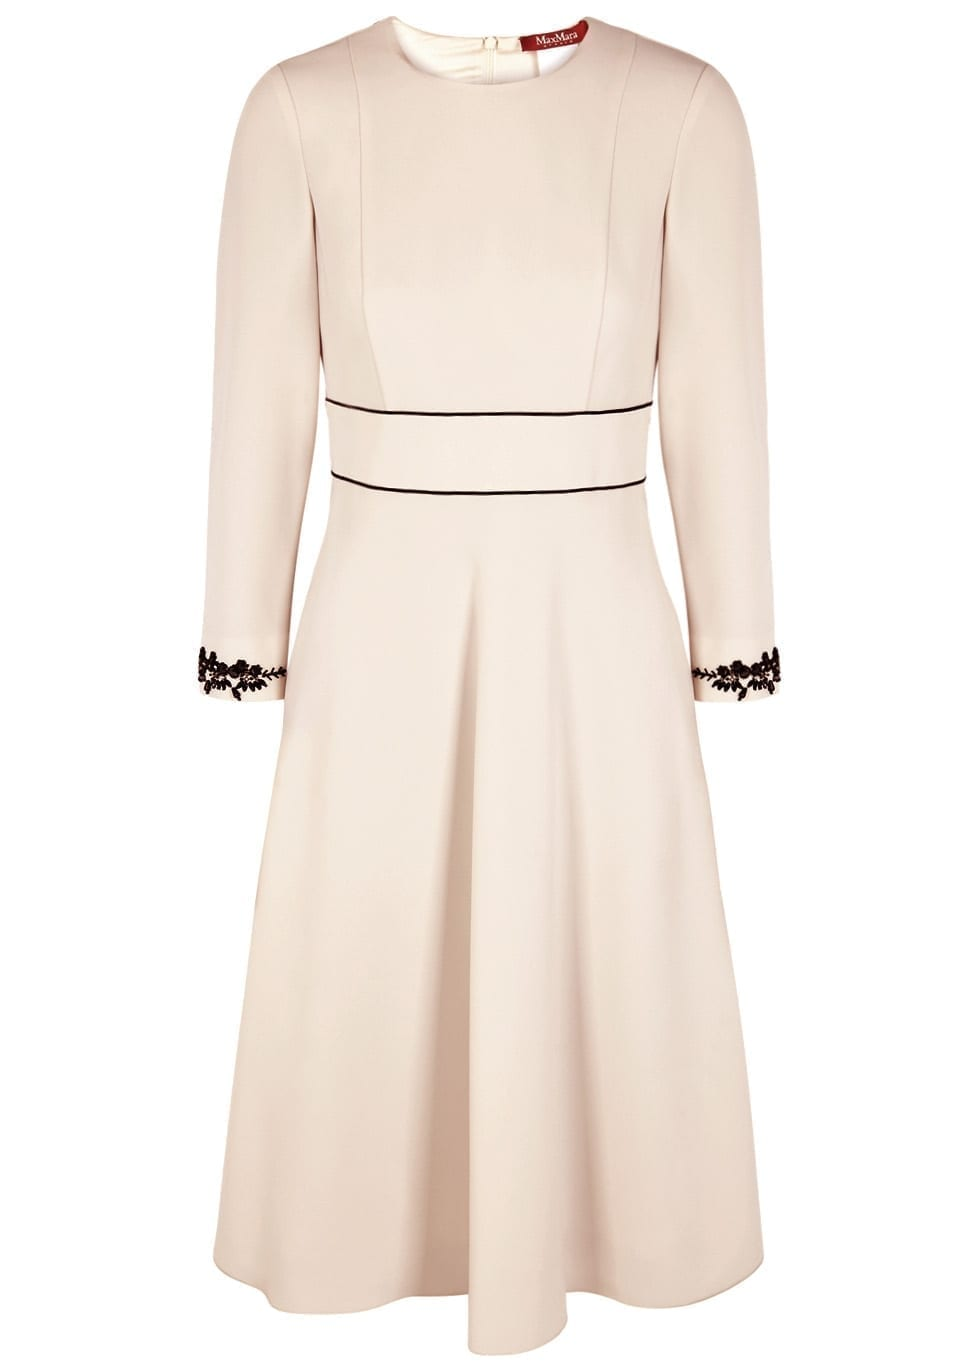 b0fcfe7abbe MAX MARA STUDIO Bardies Bead-embellished Midi Ivory Dress - We ...